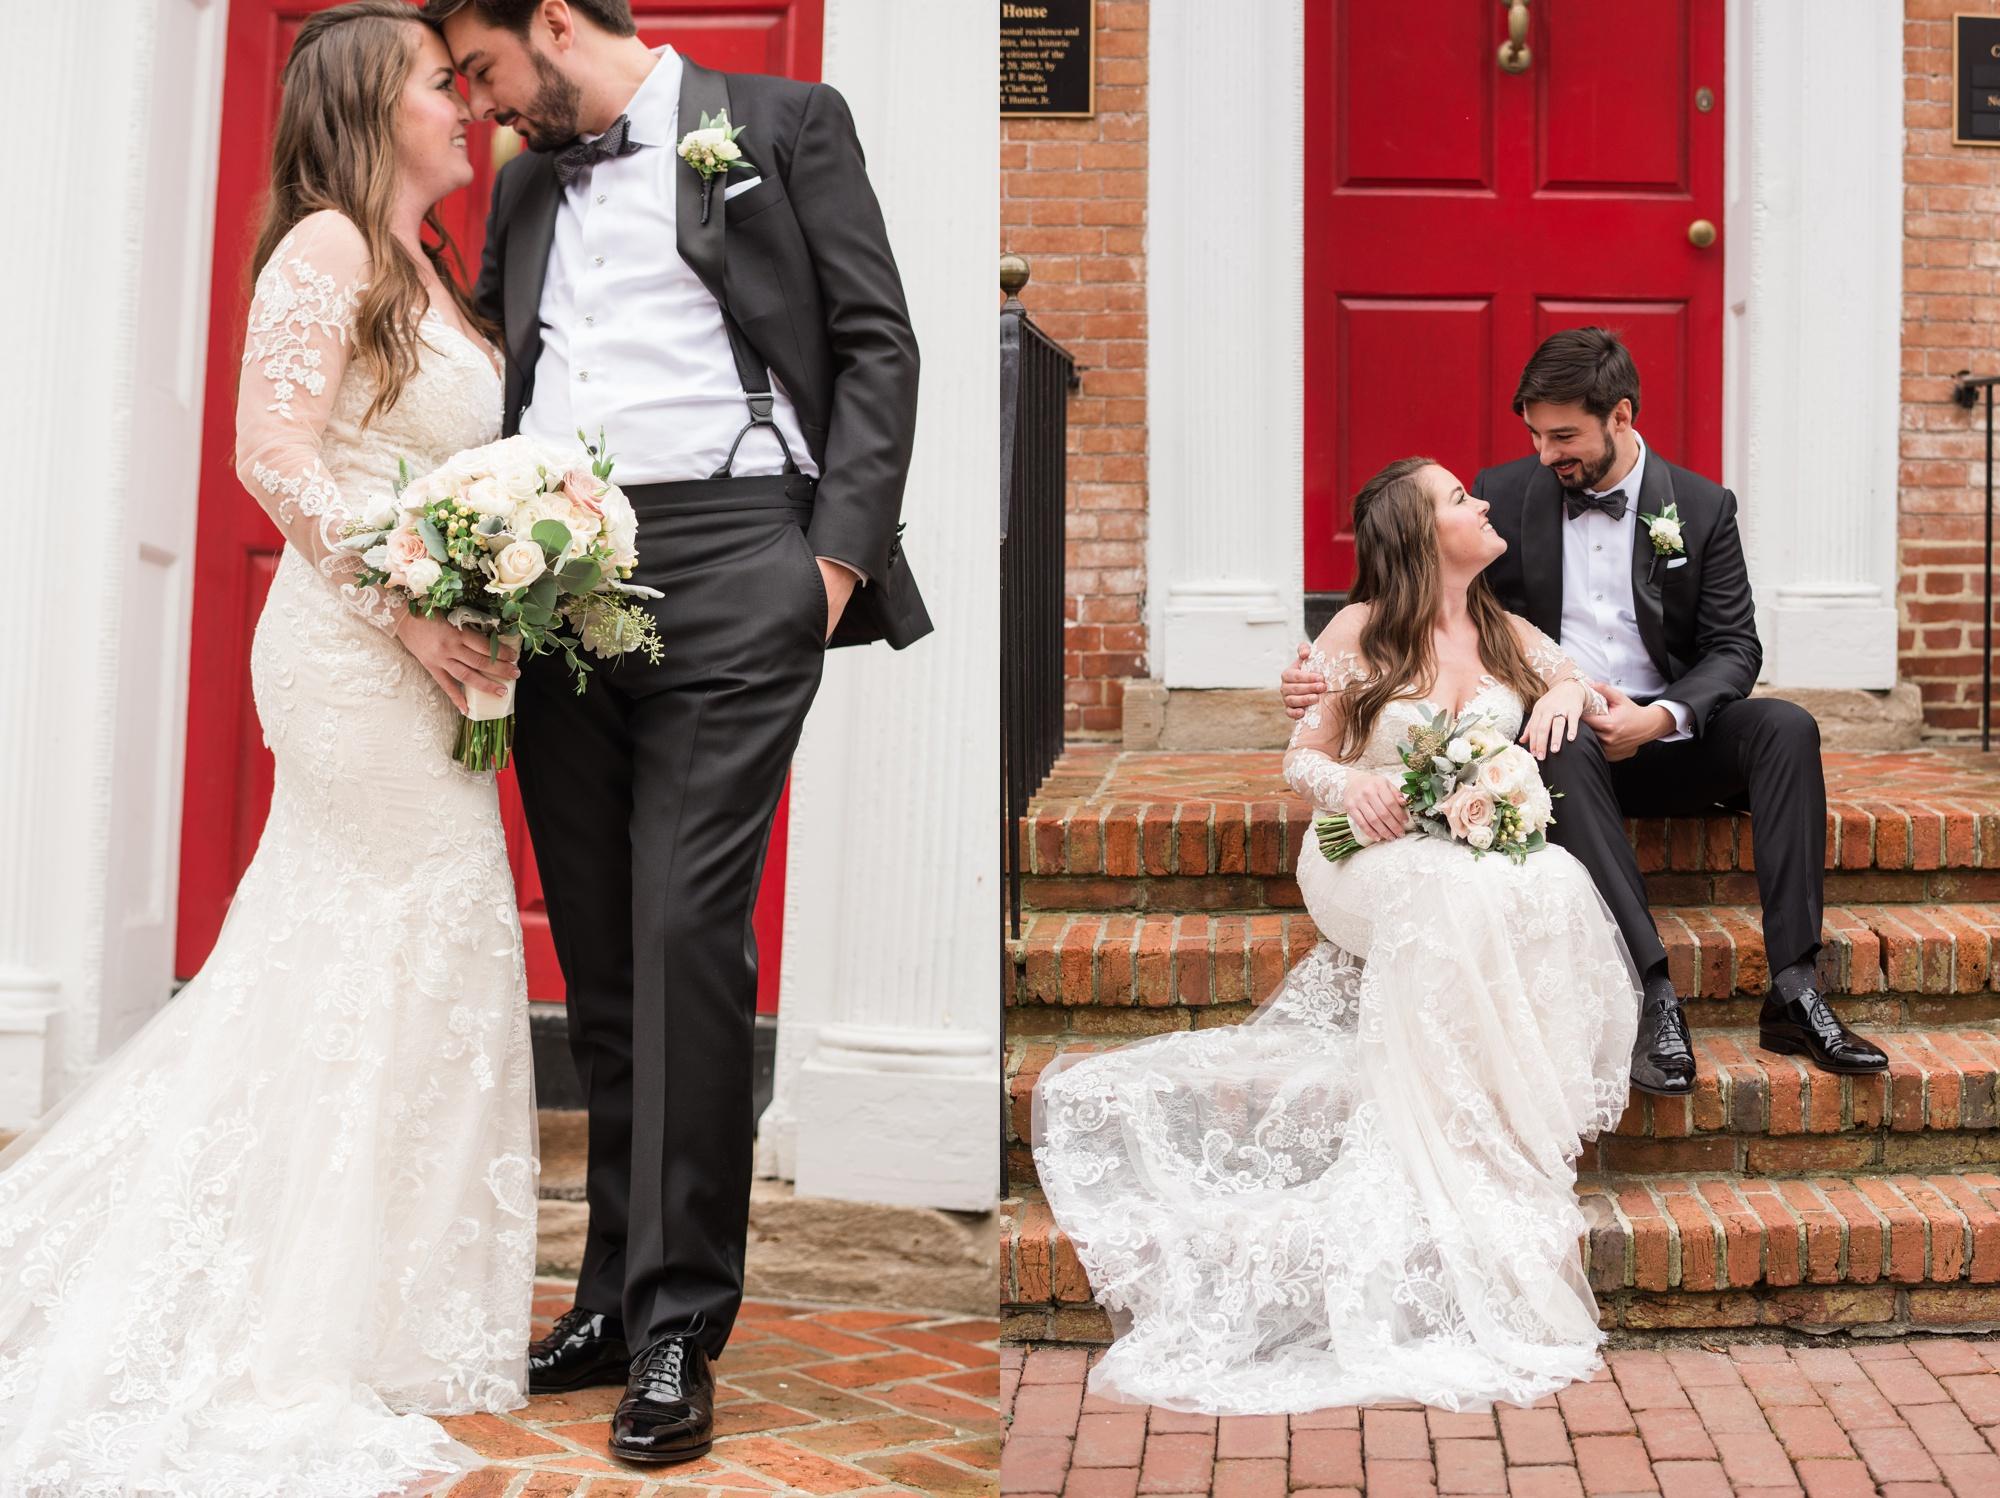 Bullet House Easton MD wedding photographer